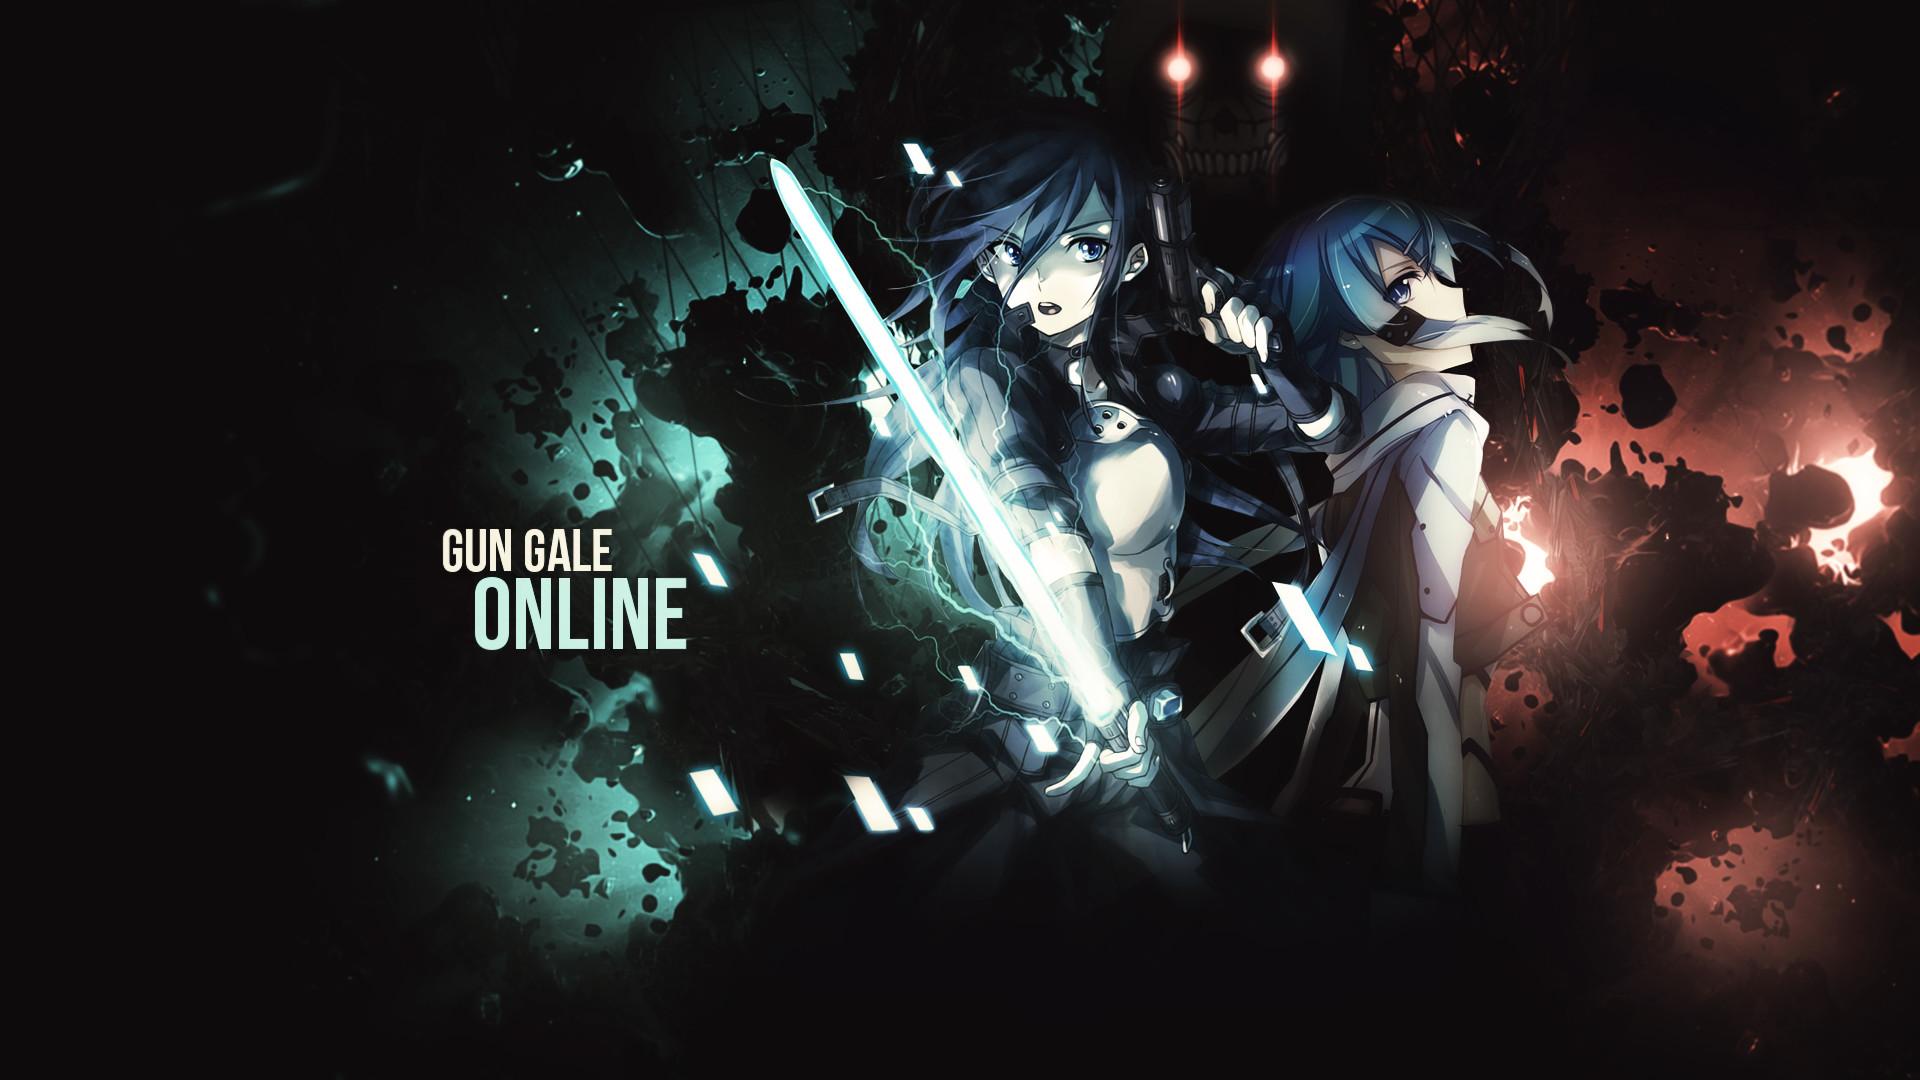 Death Gun Kirito Sinon Sword Art Online Sword Art Online II · HD Wallpaper  | Background ID:632568